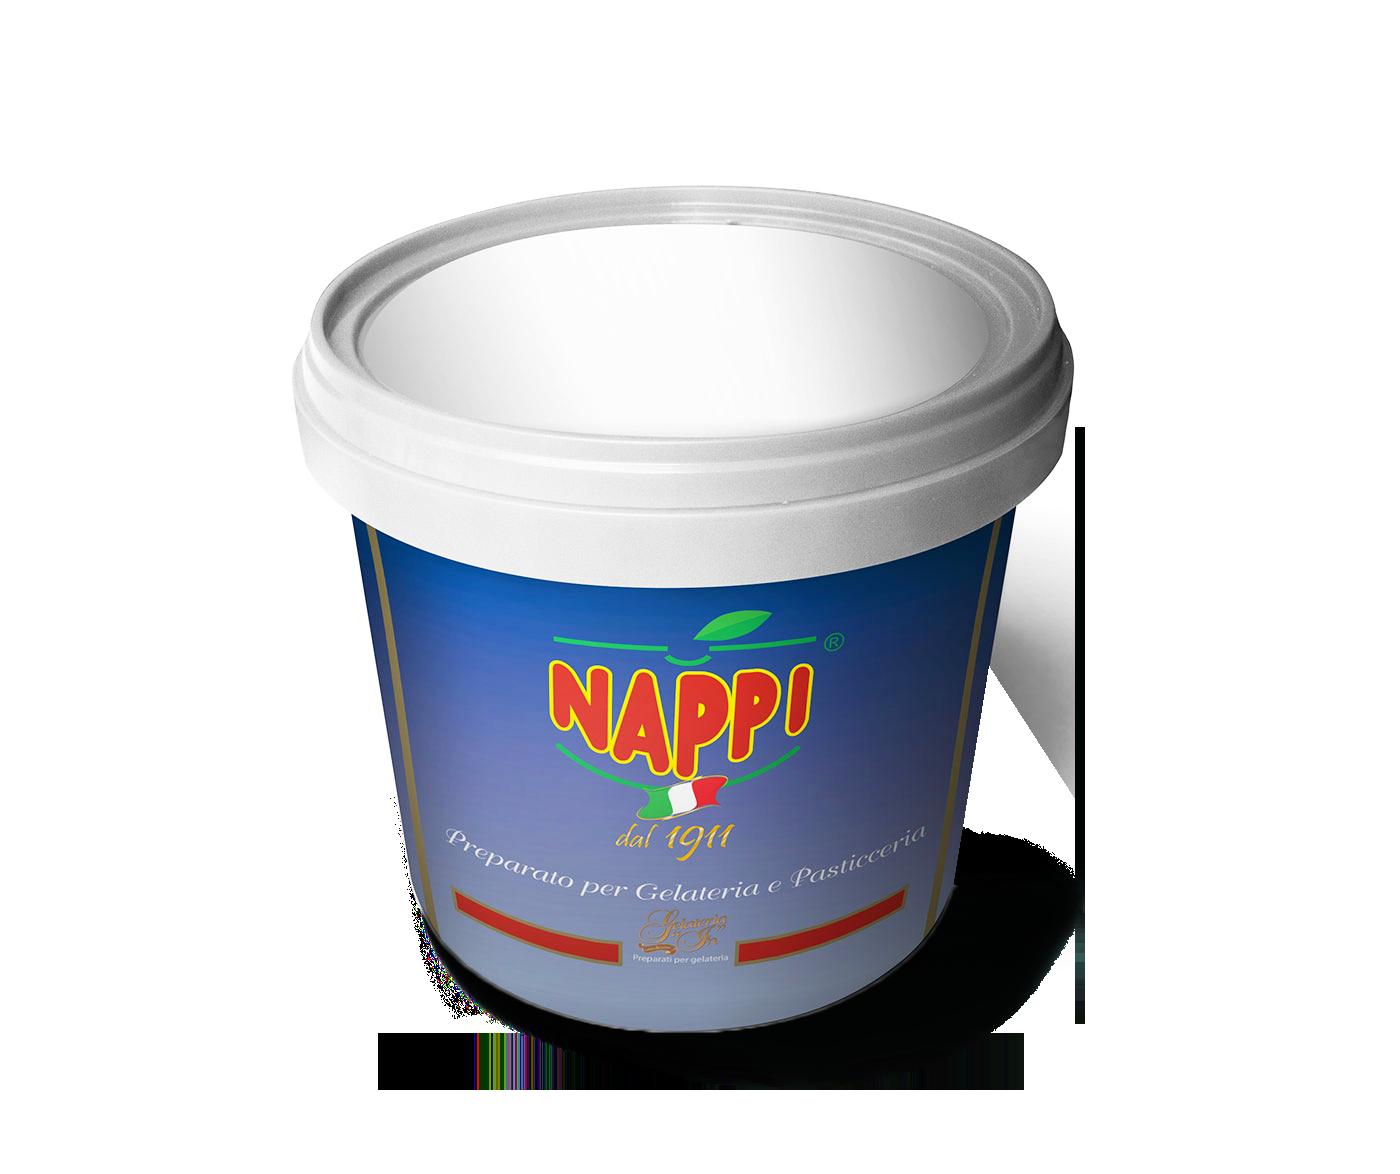 Nappi Menta (green mint) 3.5kg pail